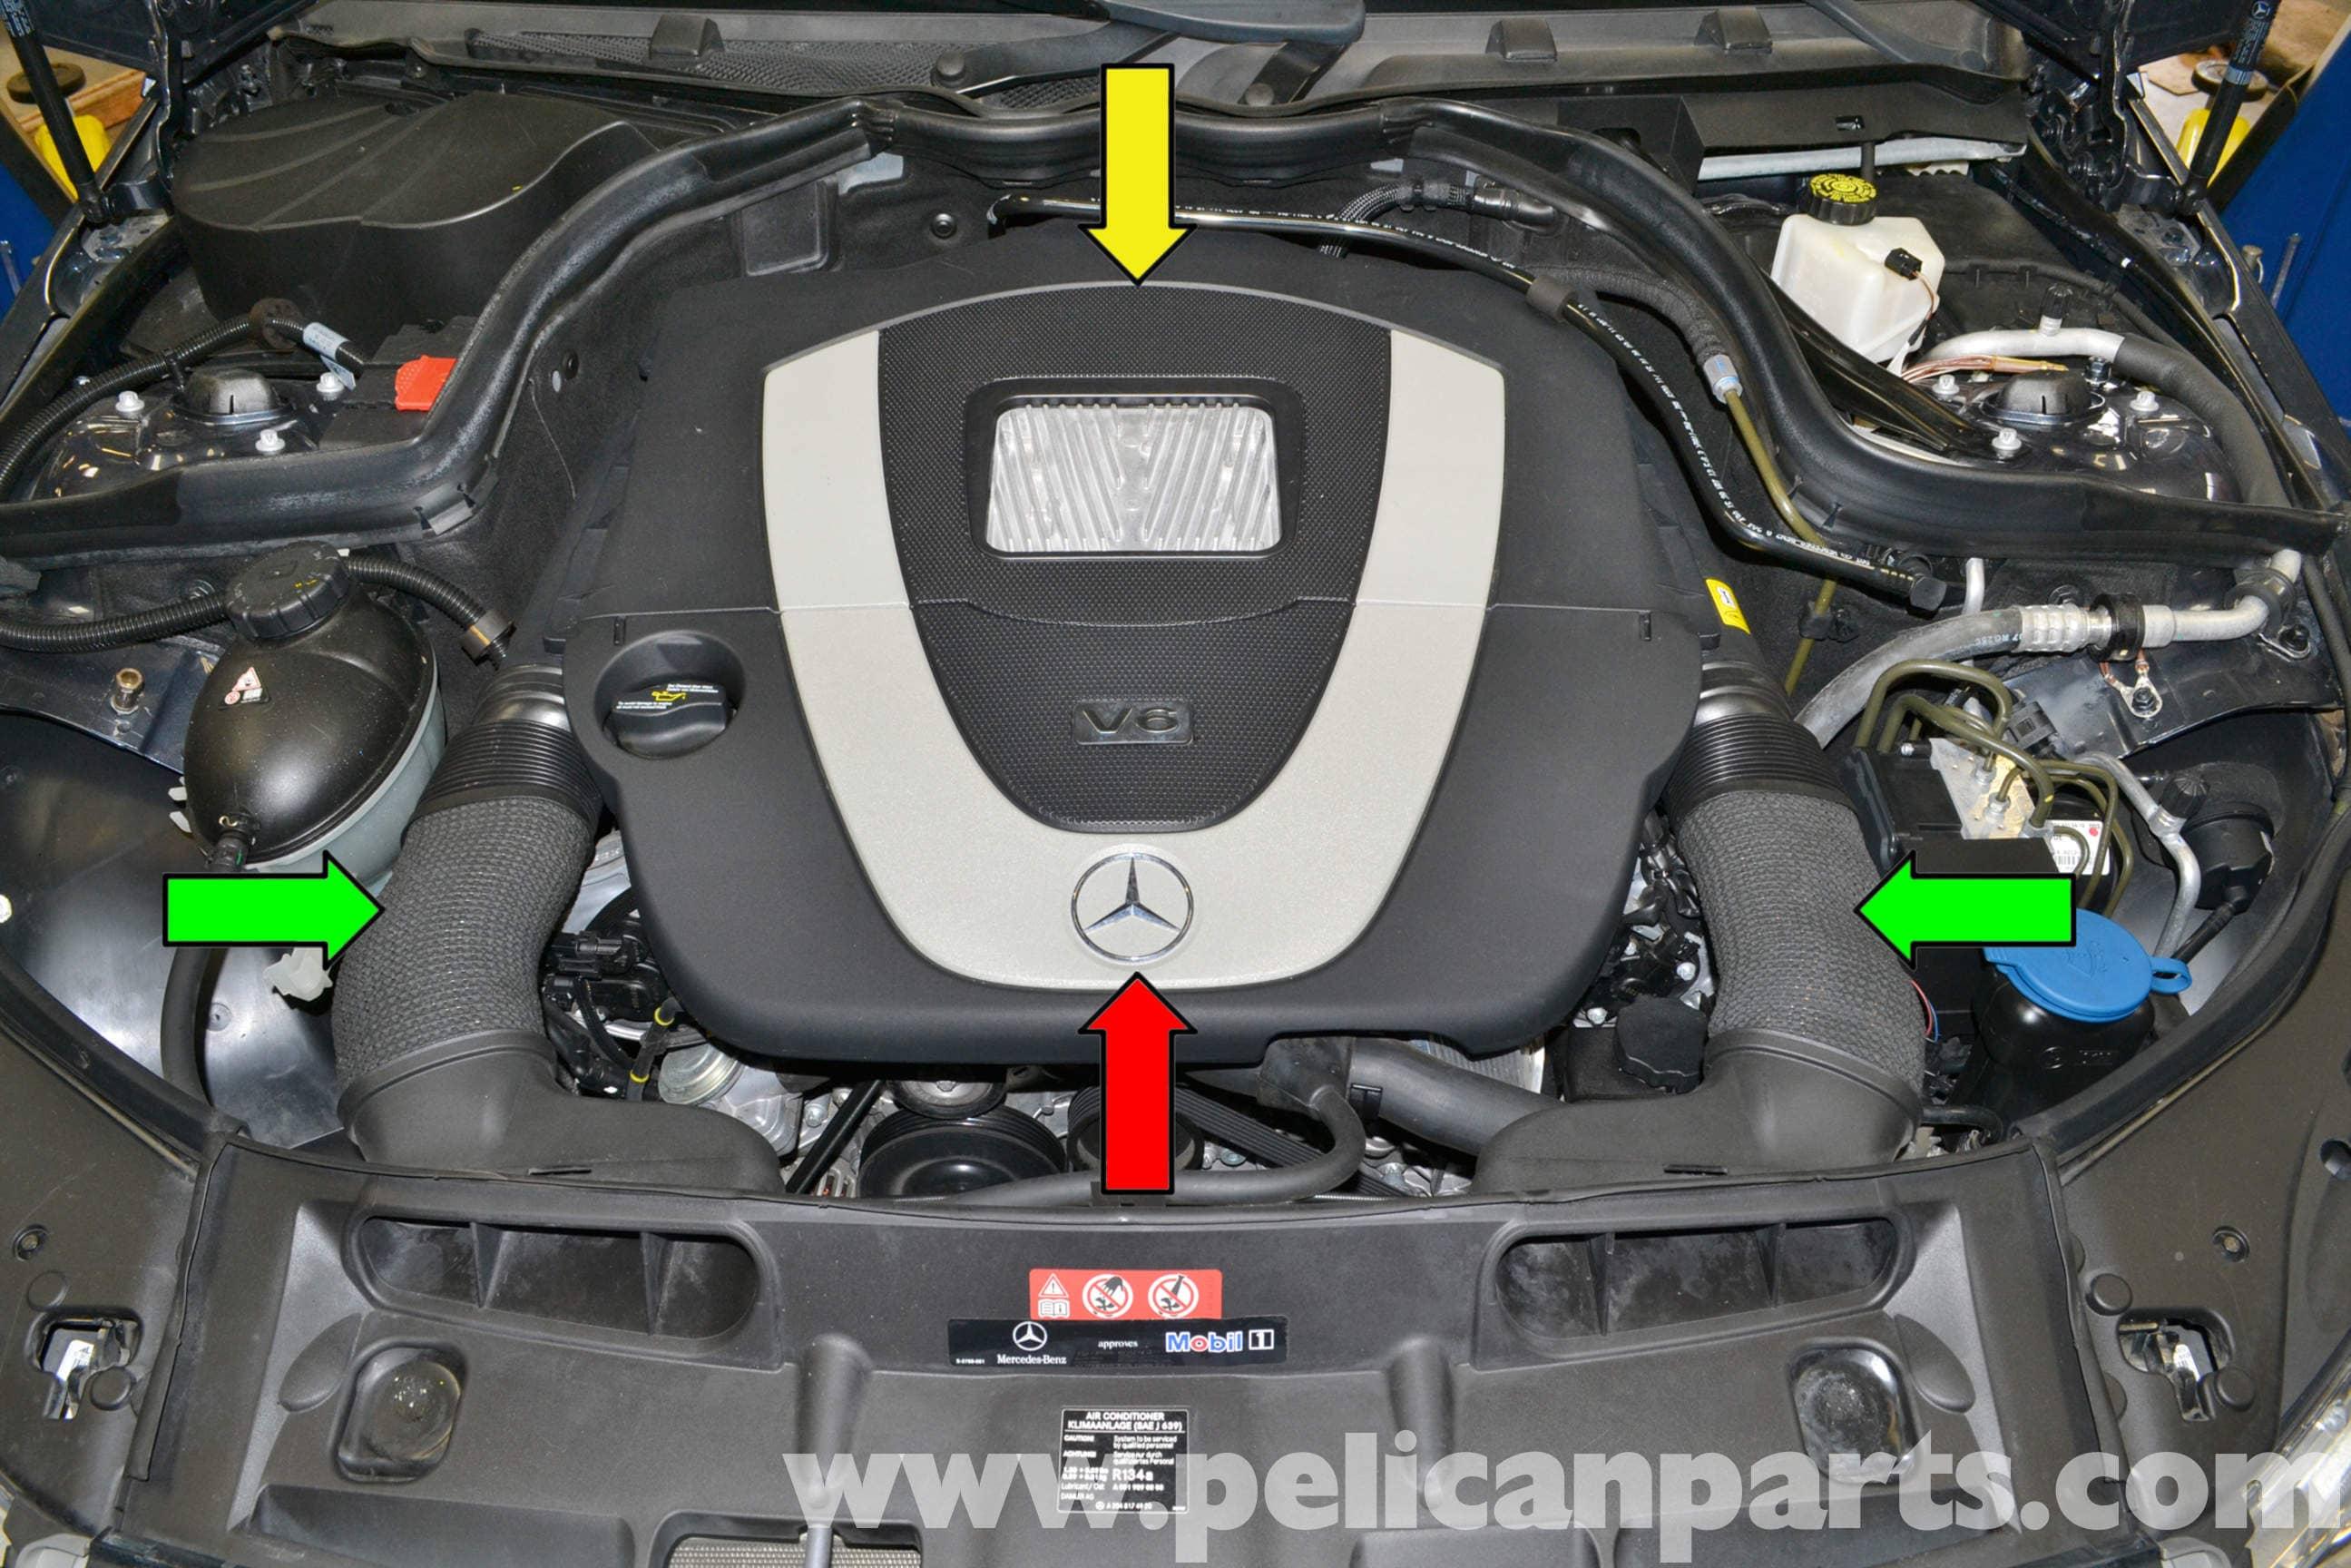 mercedes benz w204 knock sensors replacement 2008 2014 c250 rh pelicanparts  com Lexus RX300 Knock Sensor Location Lexus RX300 Knock Sensor Location